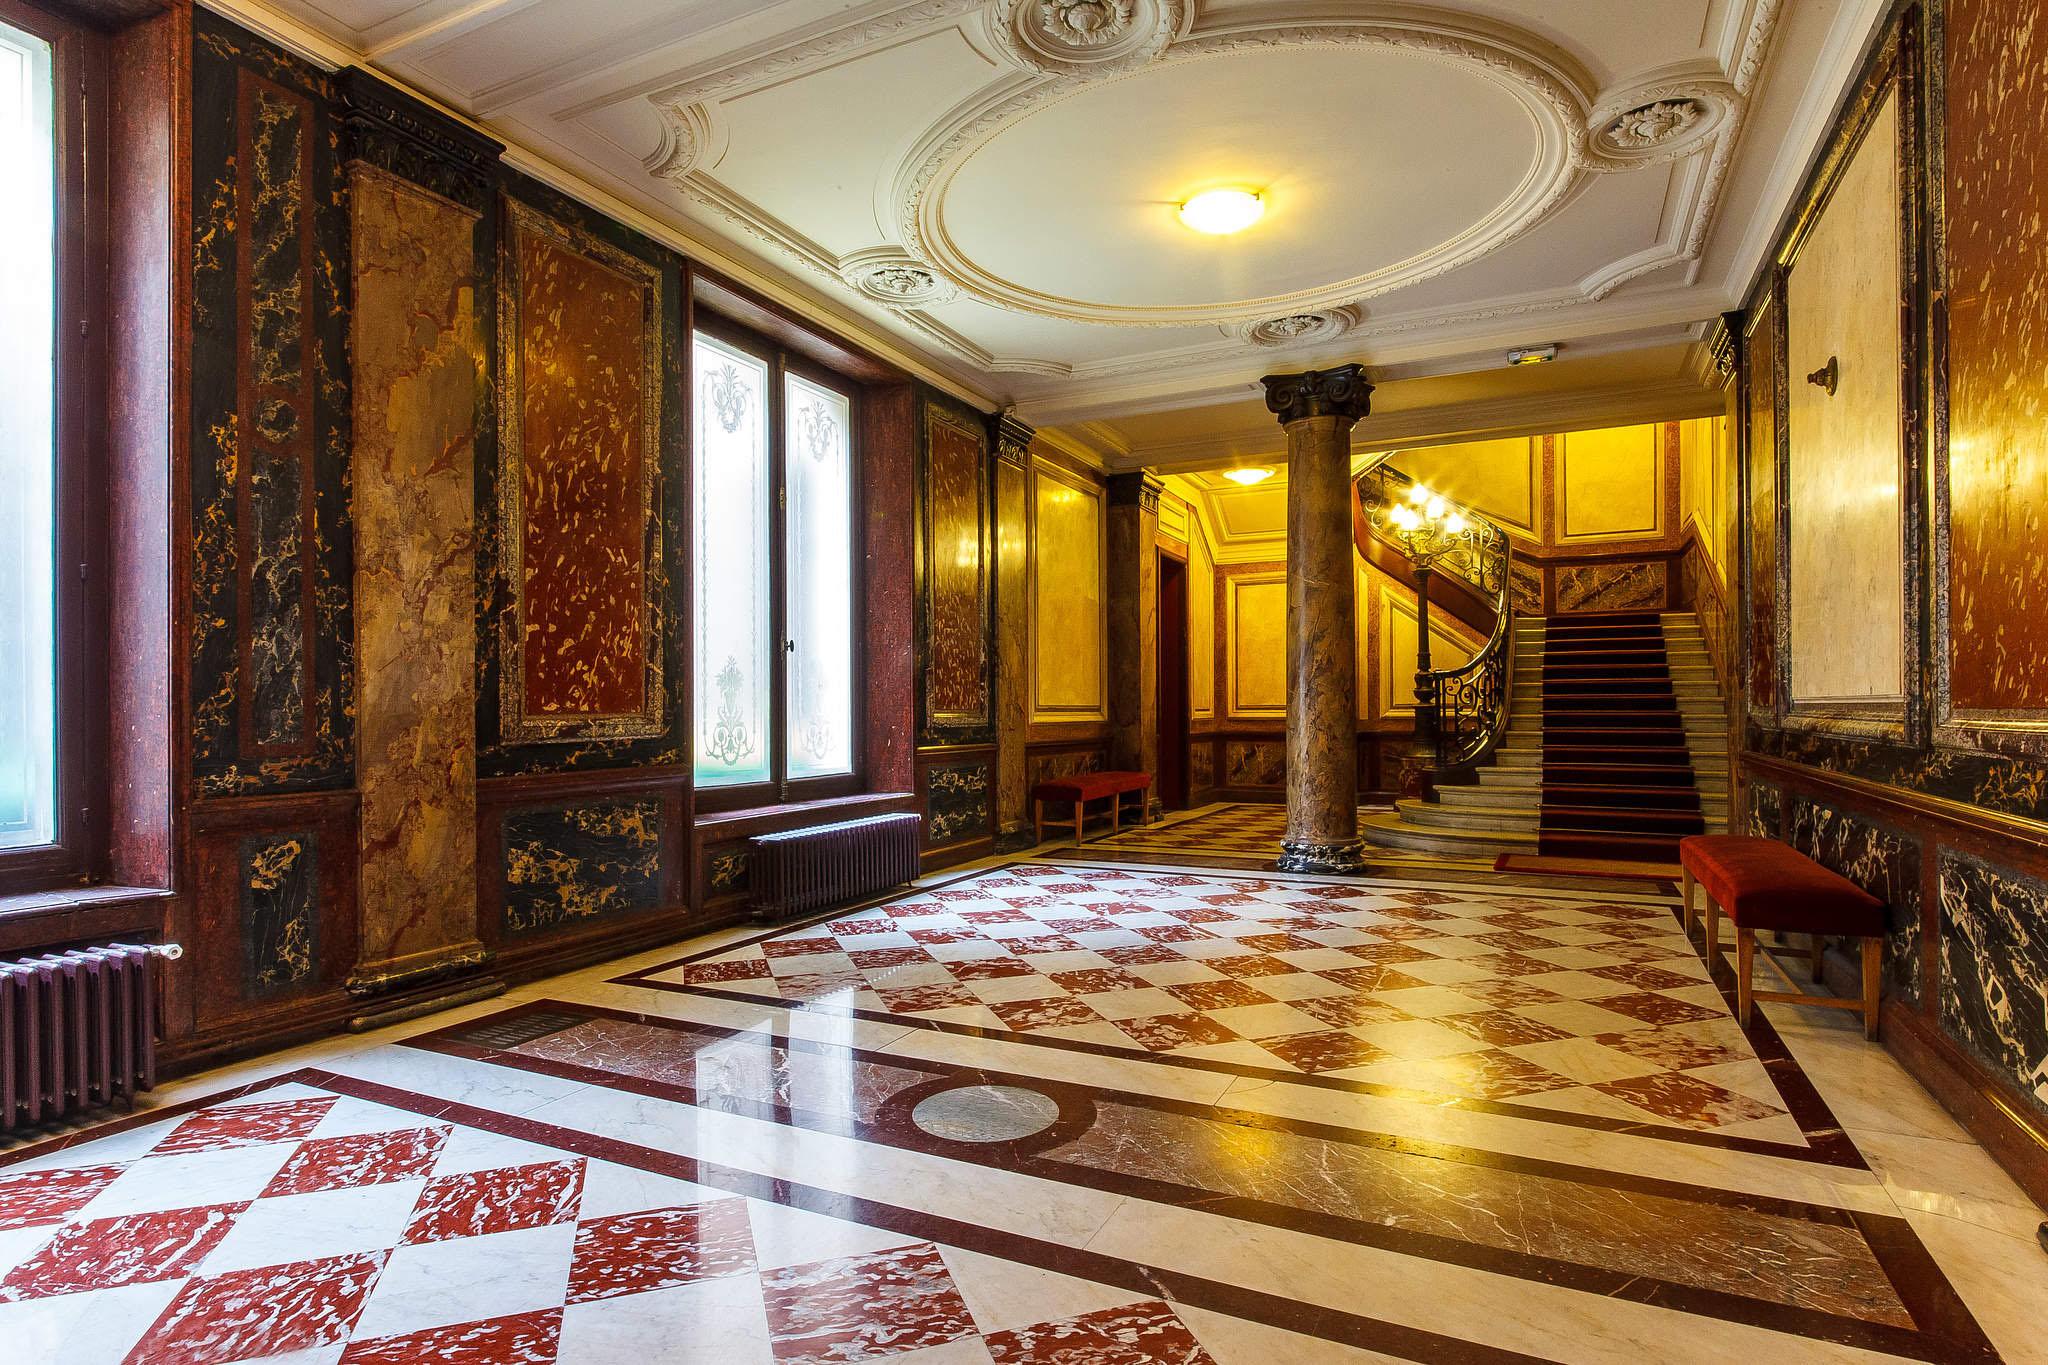 LUXURY 4 BEDROOM APARTMENT - Luxe Apartments Rentals